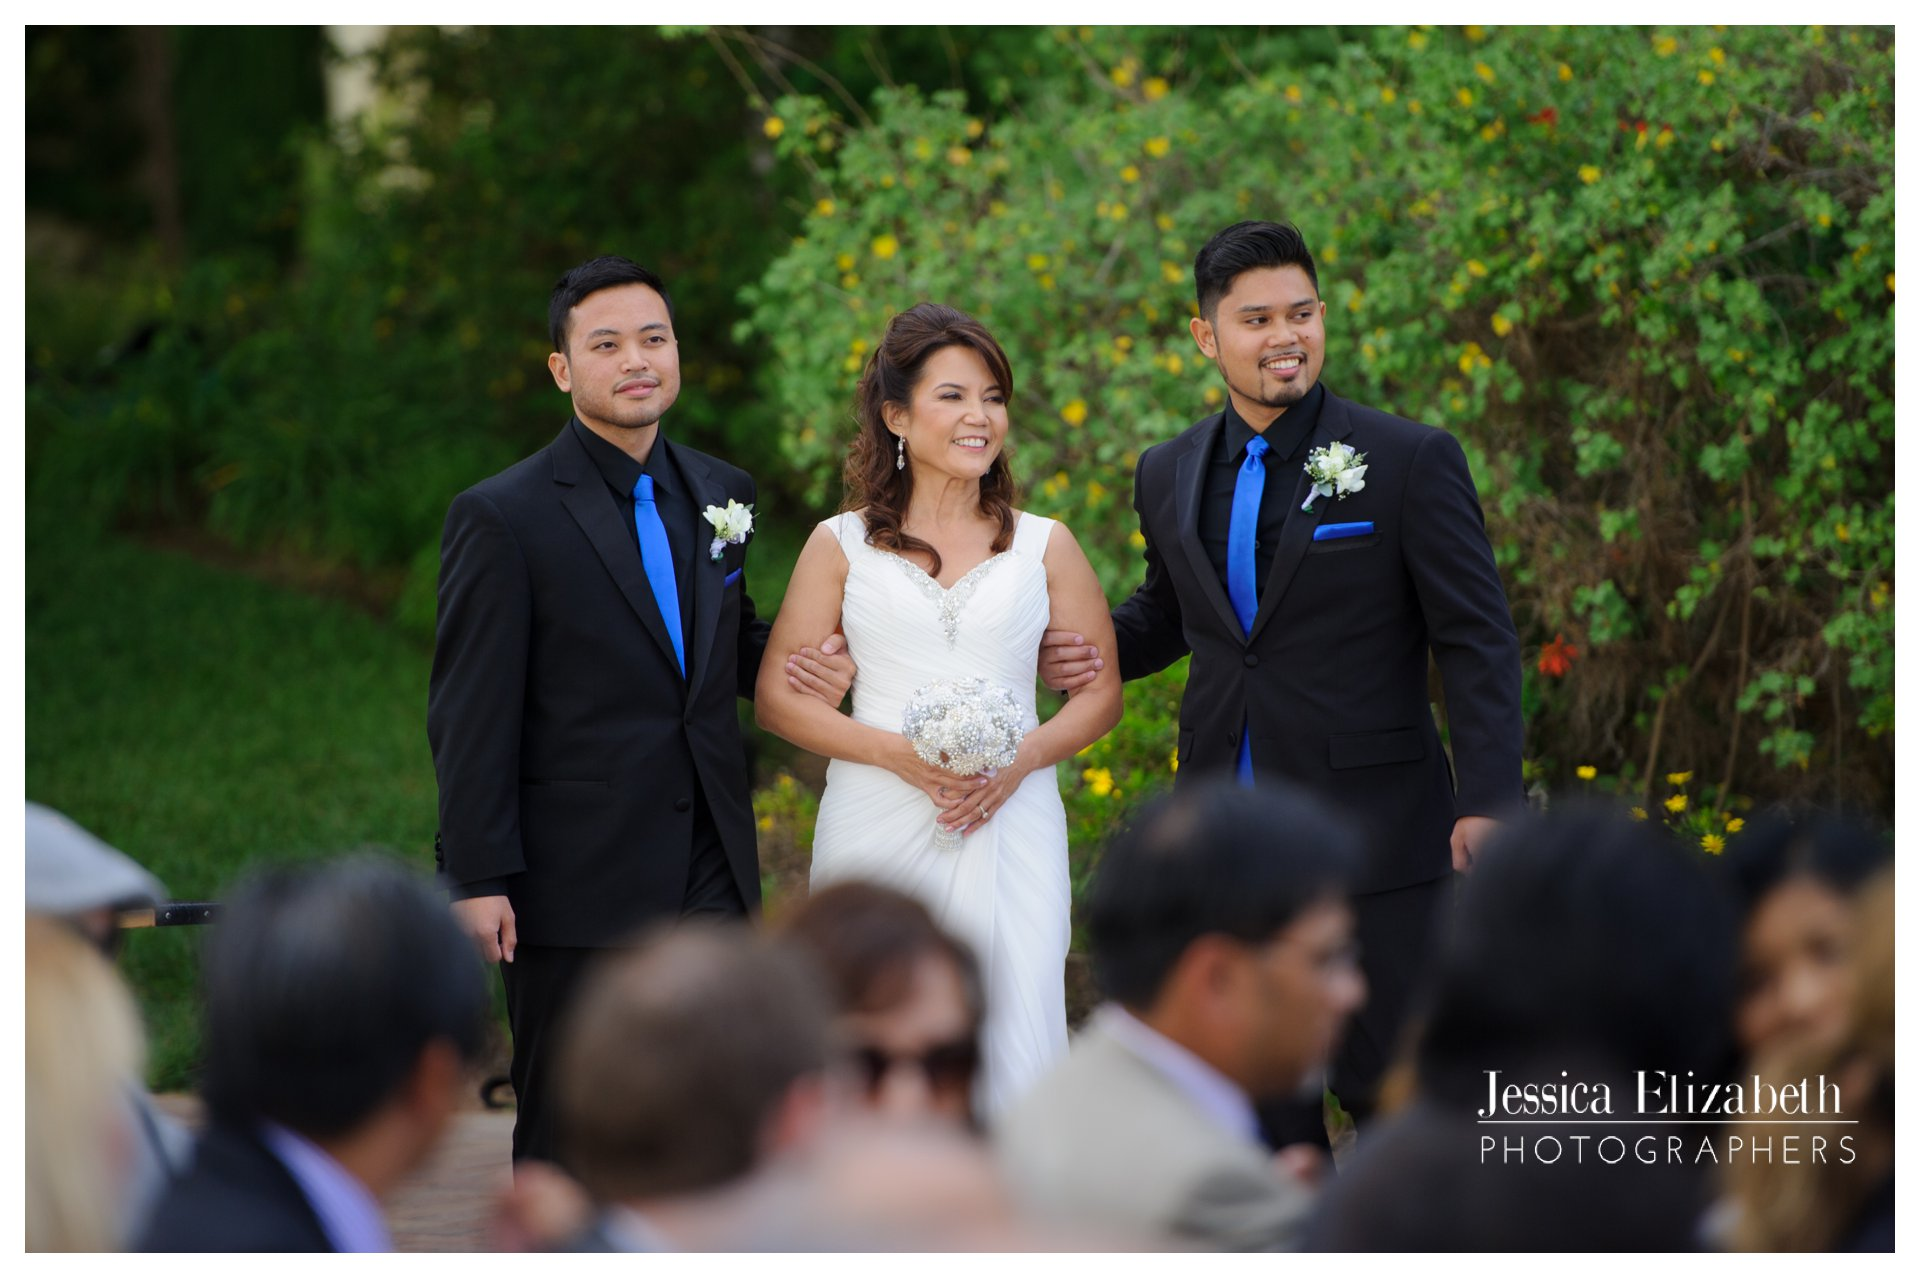 08-Terranea-Palos-Verdes-Wedding-Photography-by-Jessica-Elizabeth-w.jpg